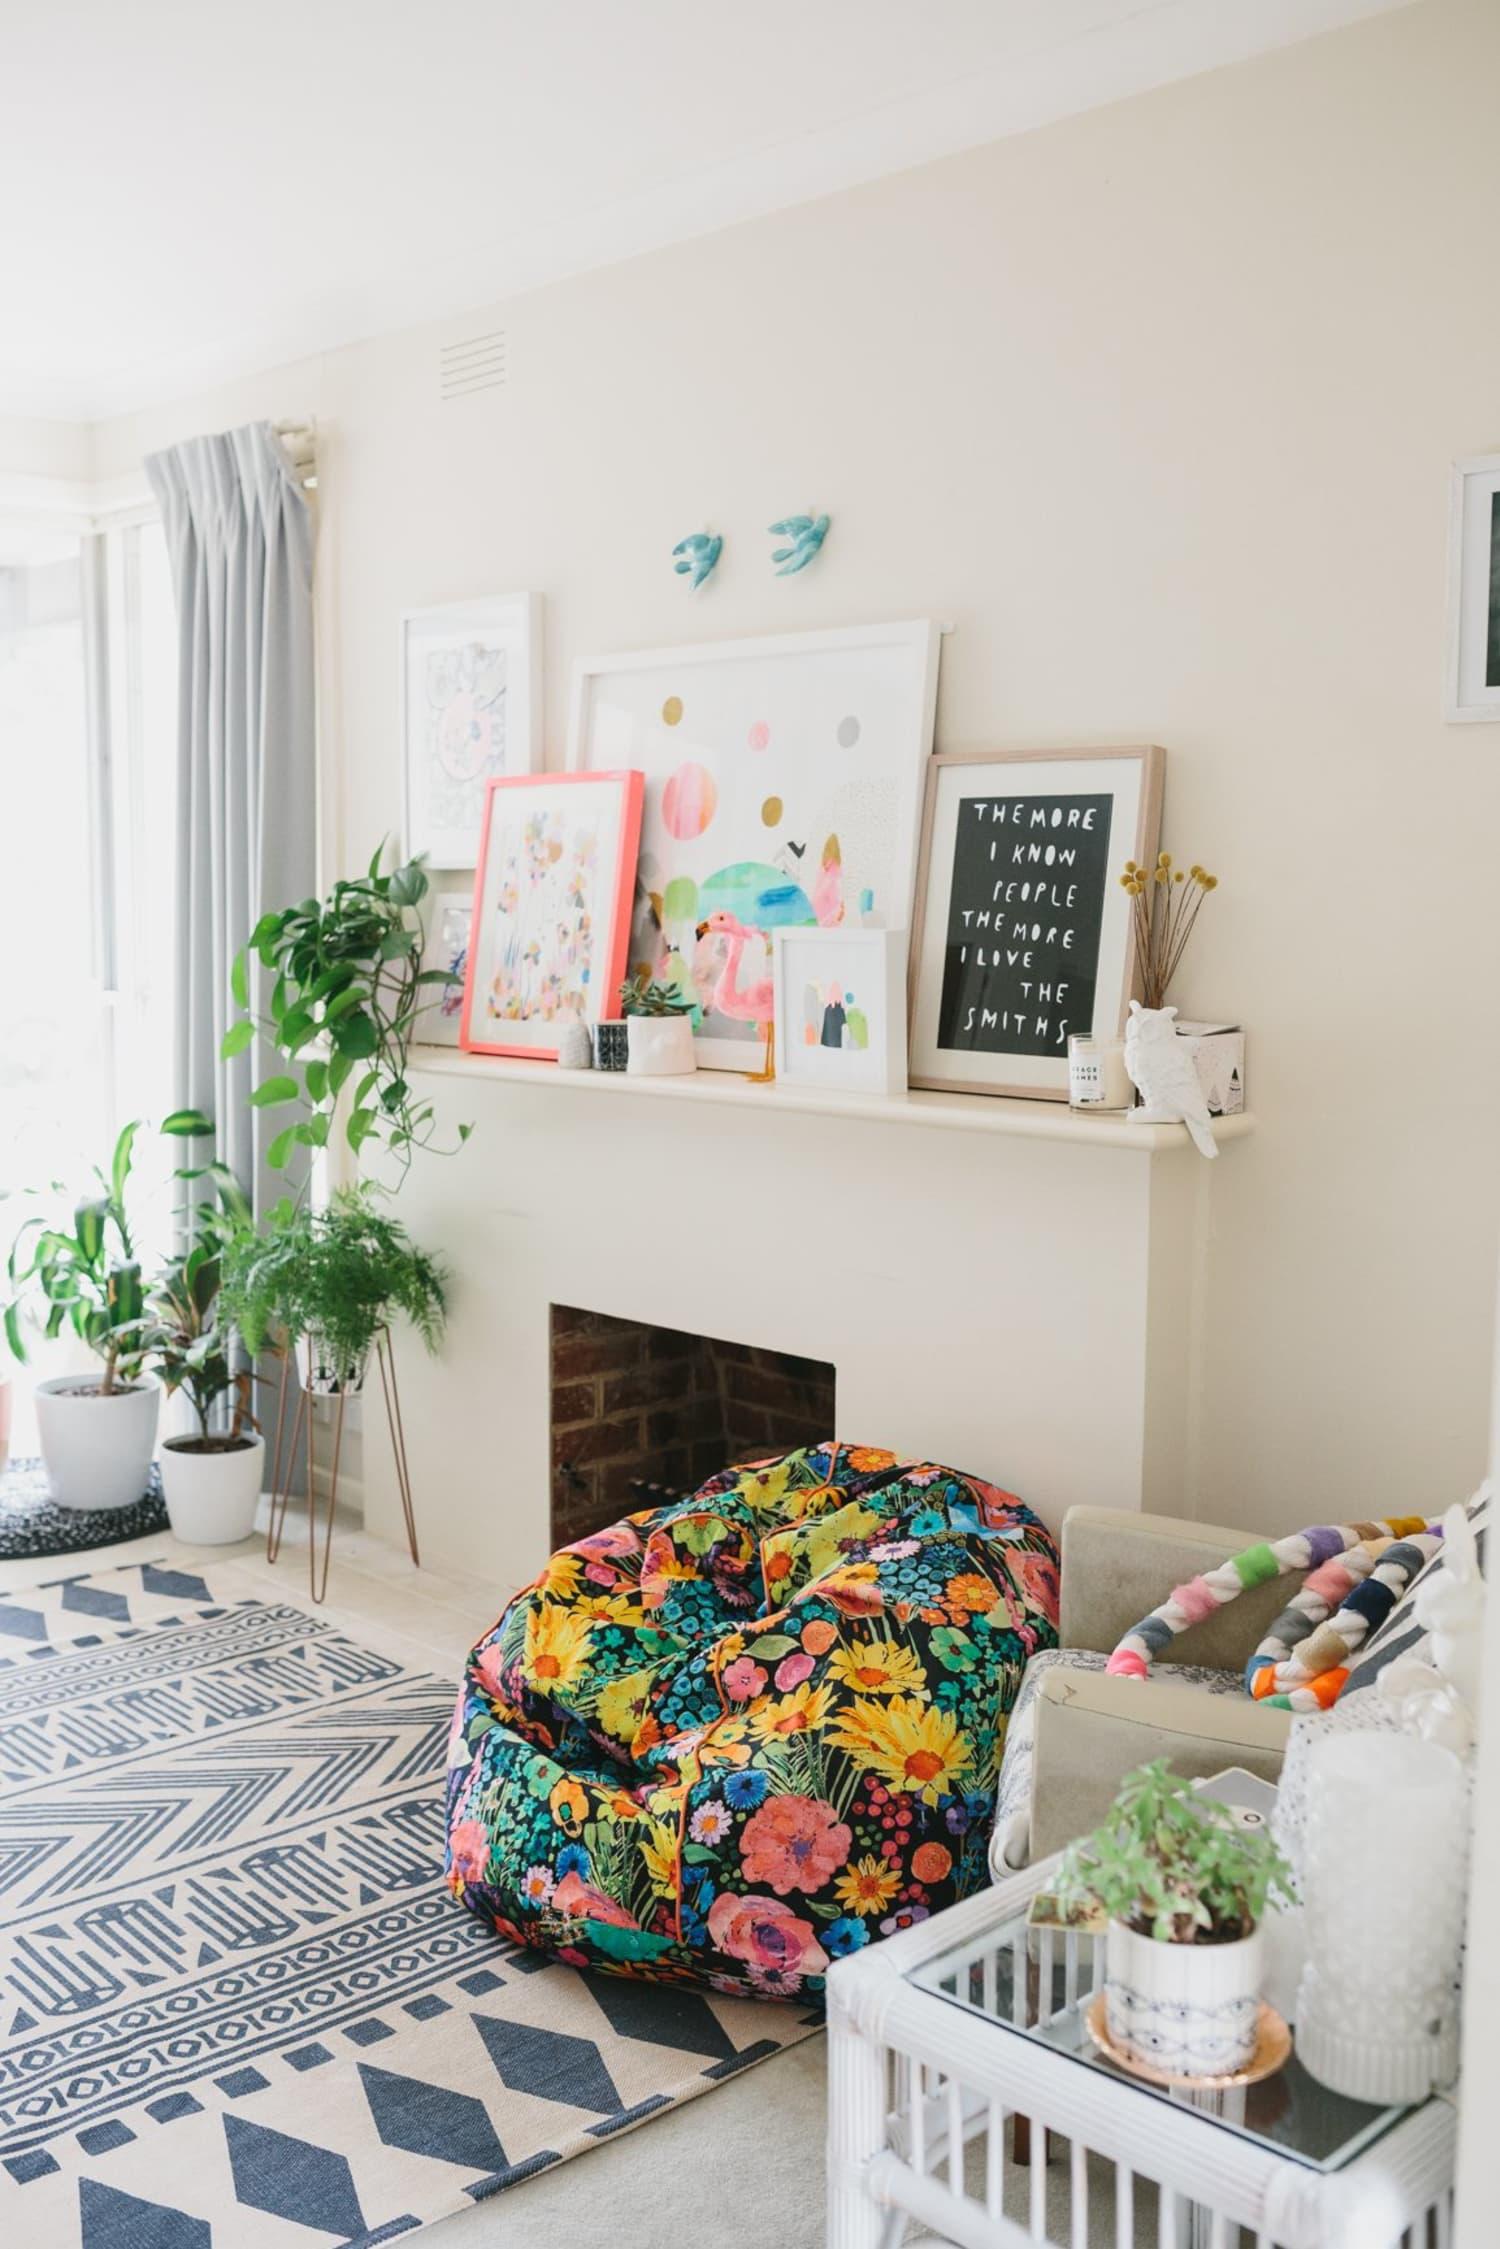 надписей придумана как украсить съемную квартиру своими руками фото мало кто знает